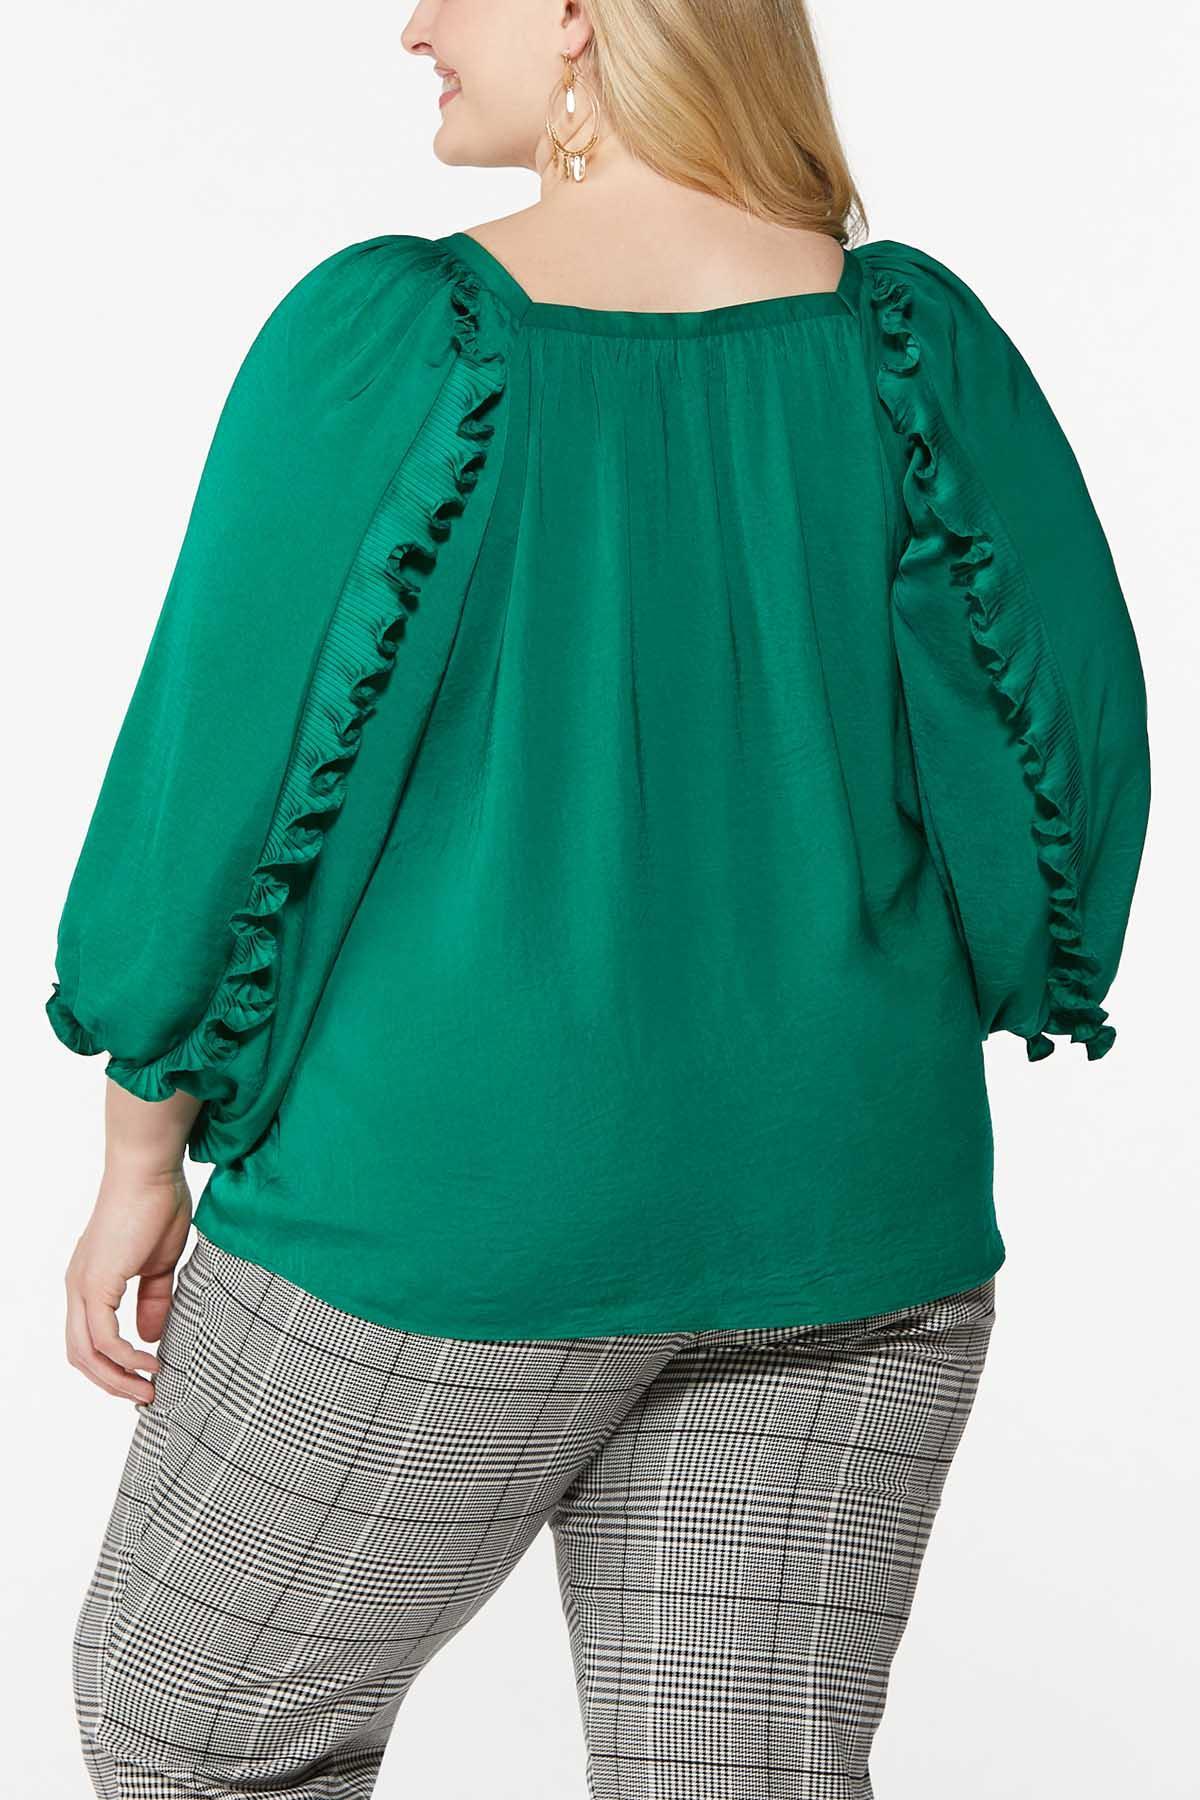 Plus Size Silky Ruffled Sleeve Top (Item #44706515)